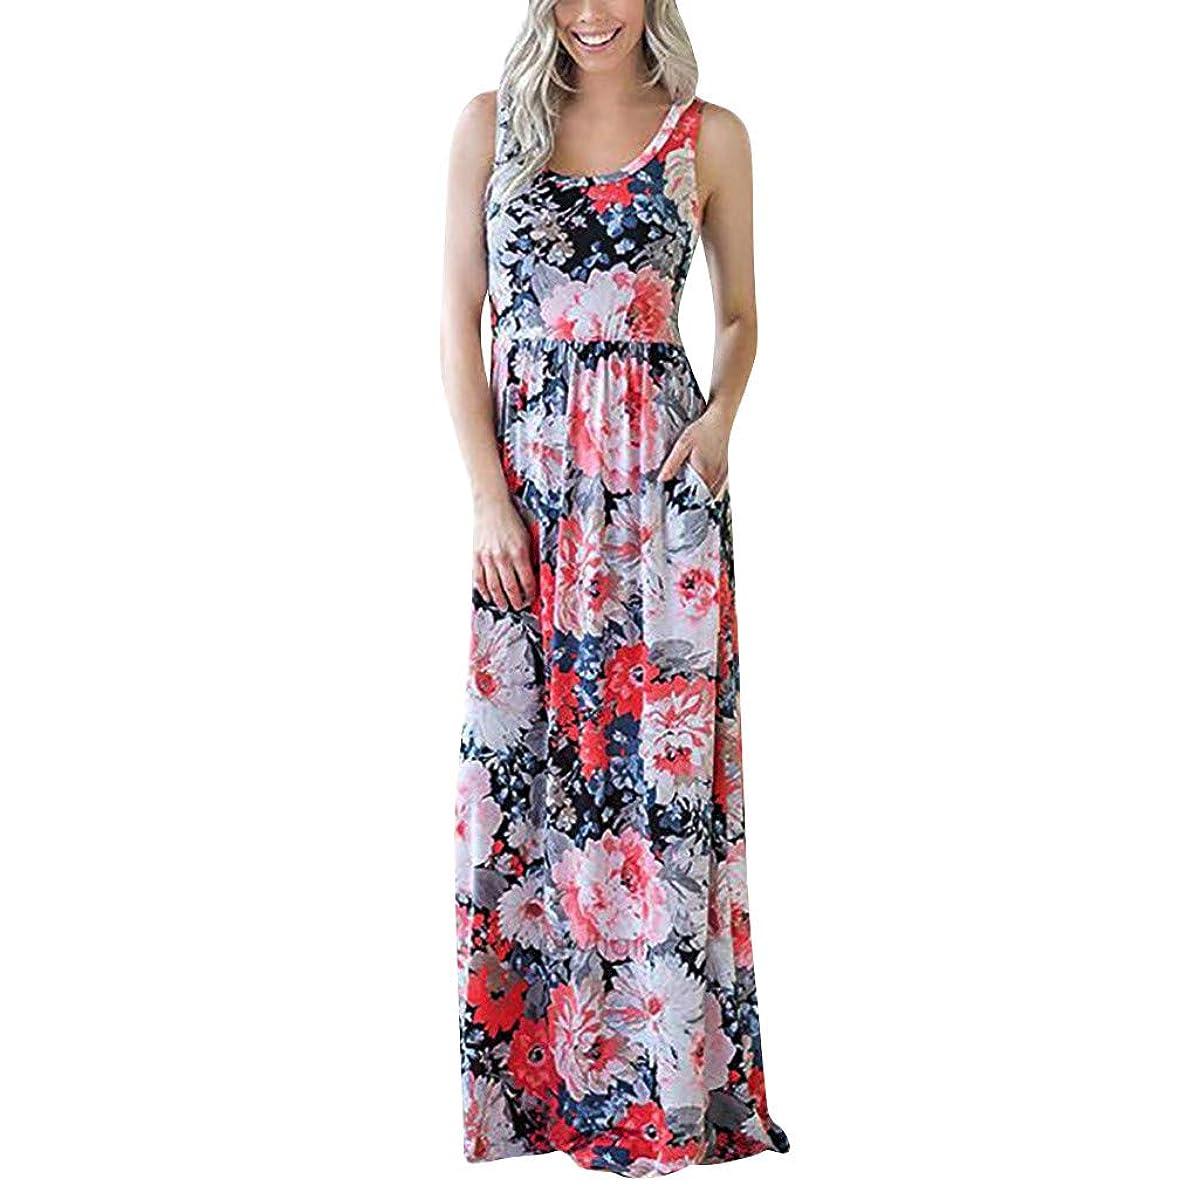 TOTOD Dress - Womens Sleeveless Bohemian Tie-Dye Illusion Print Racerback Long Tank Beach Sundress